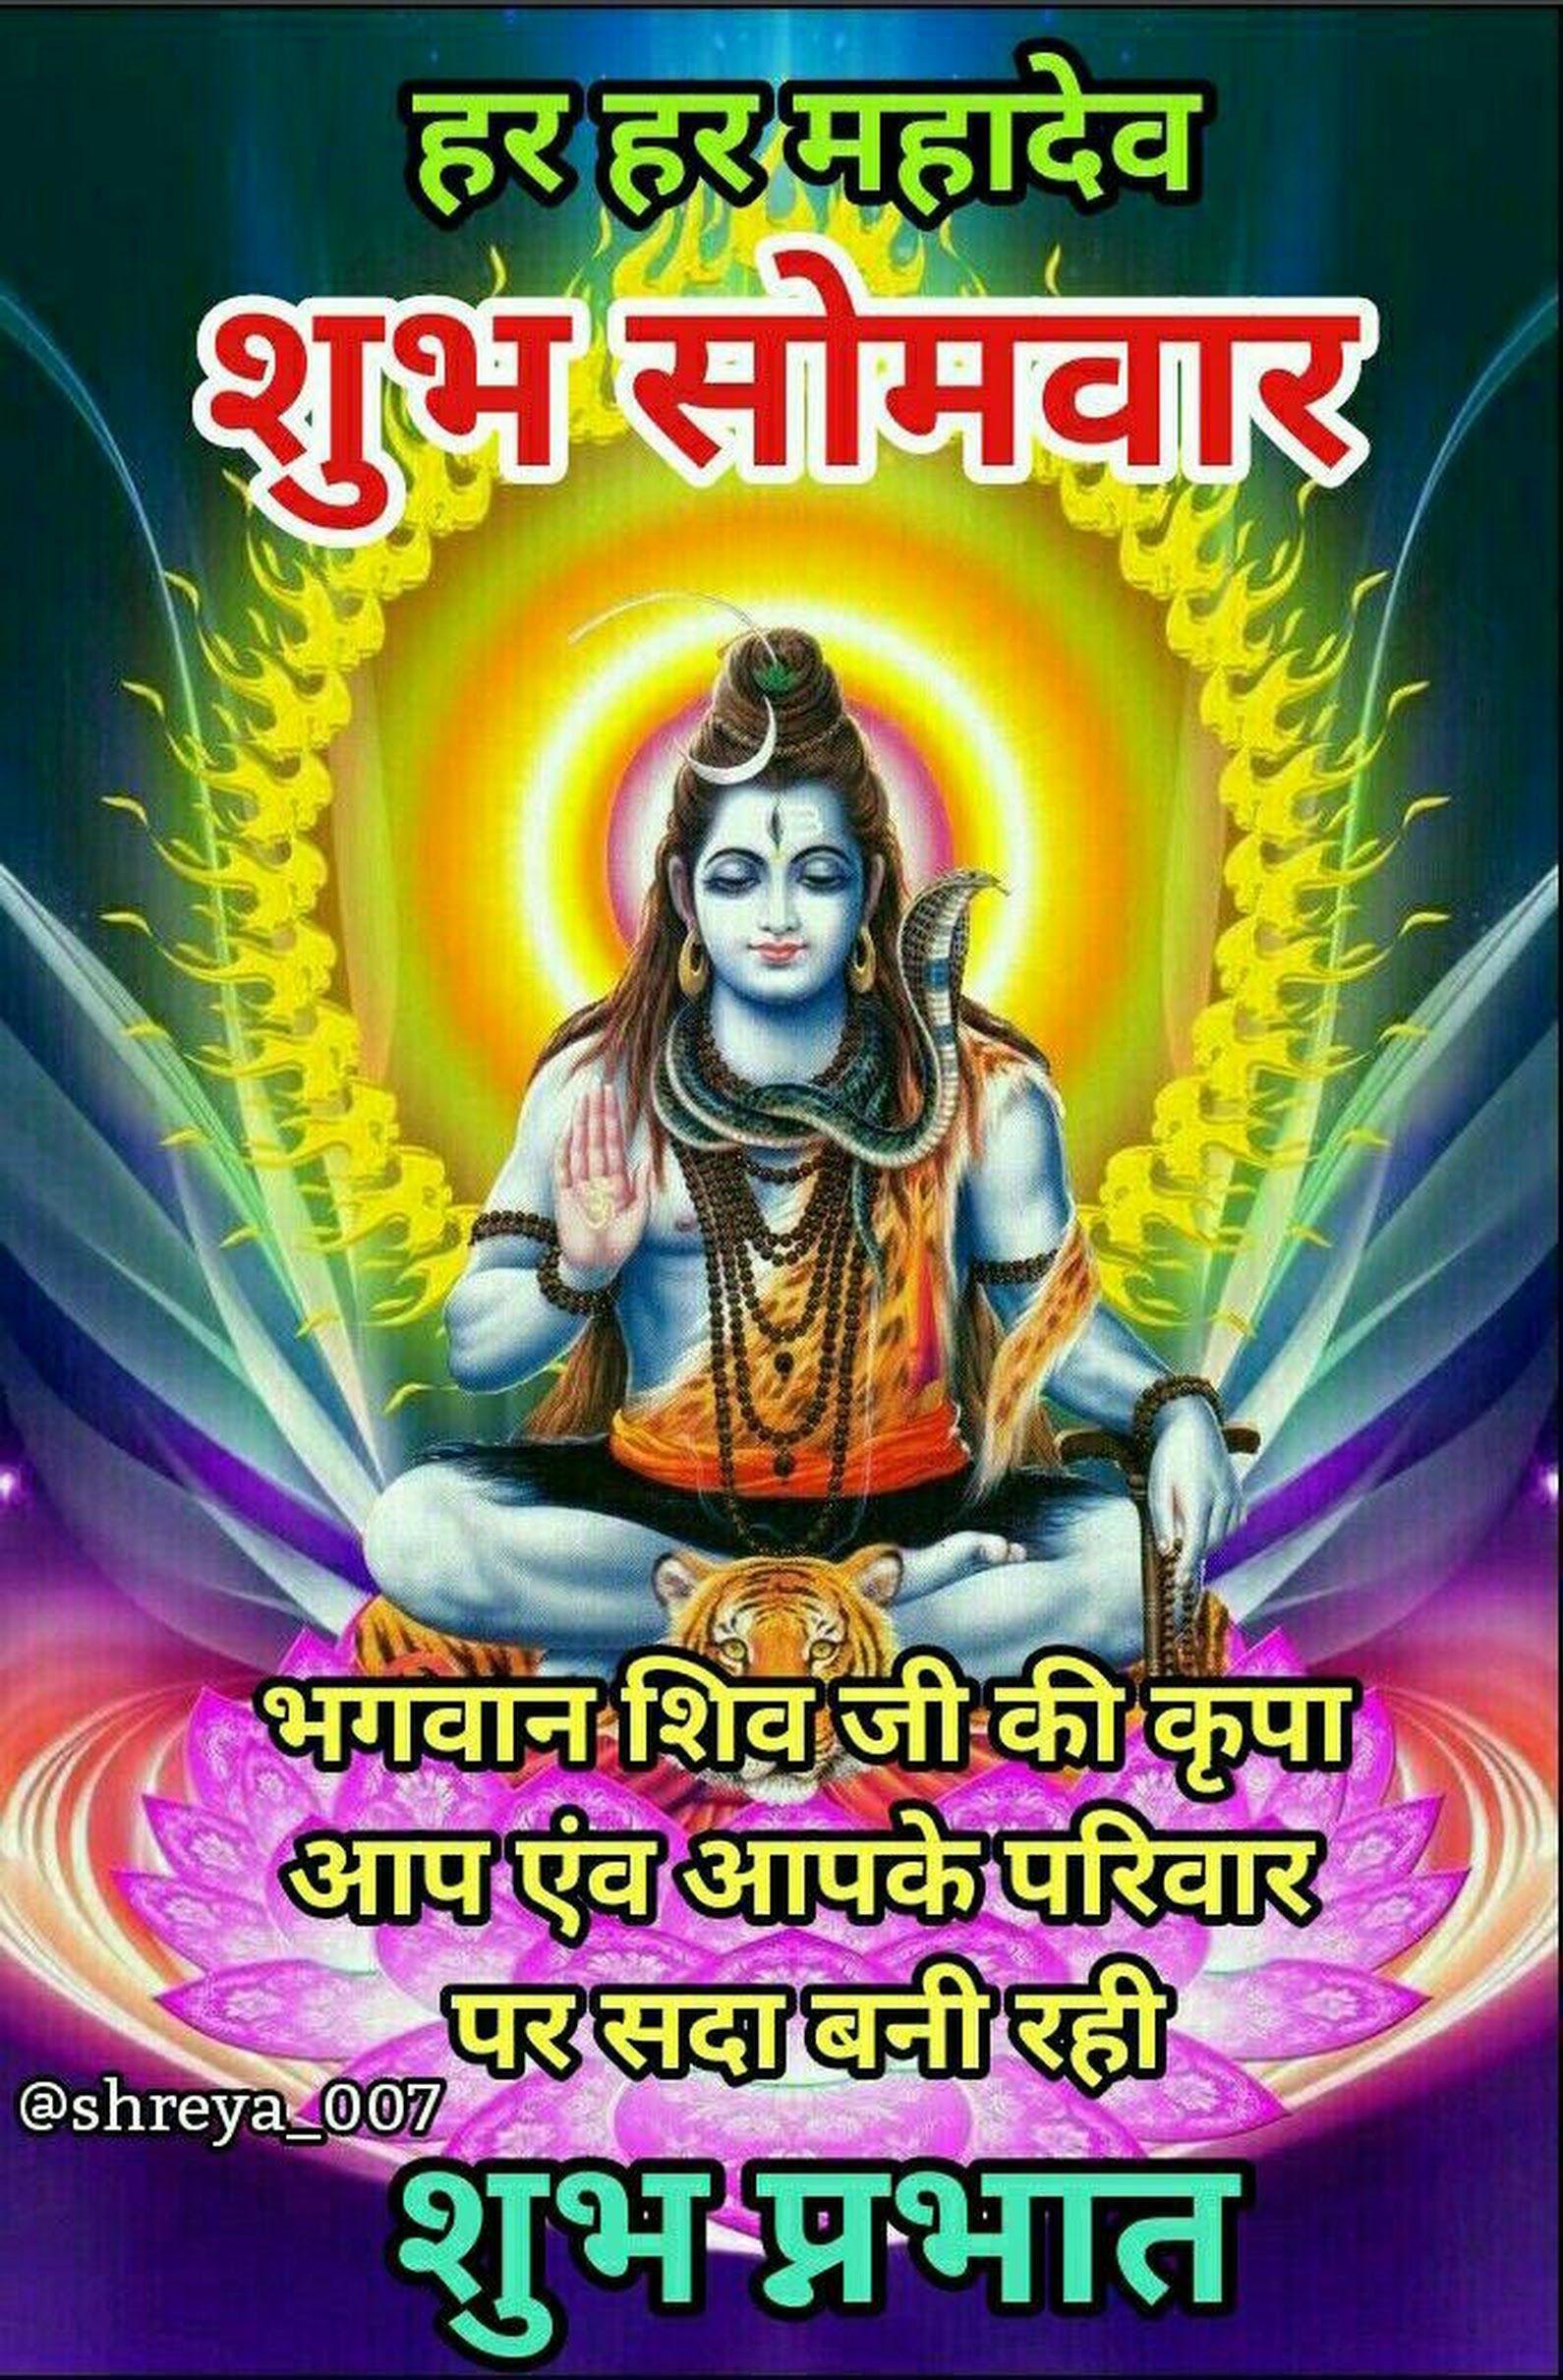 Namo Shivaye Happy Monday Ramu Giri Google Som